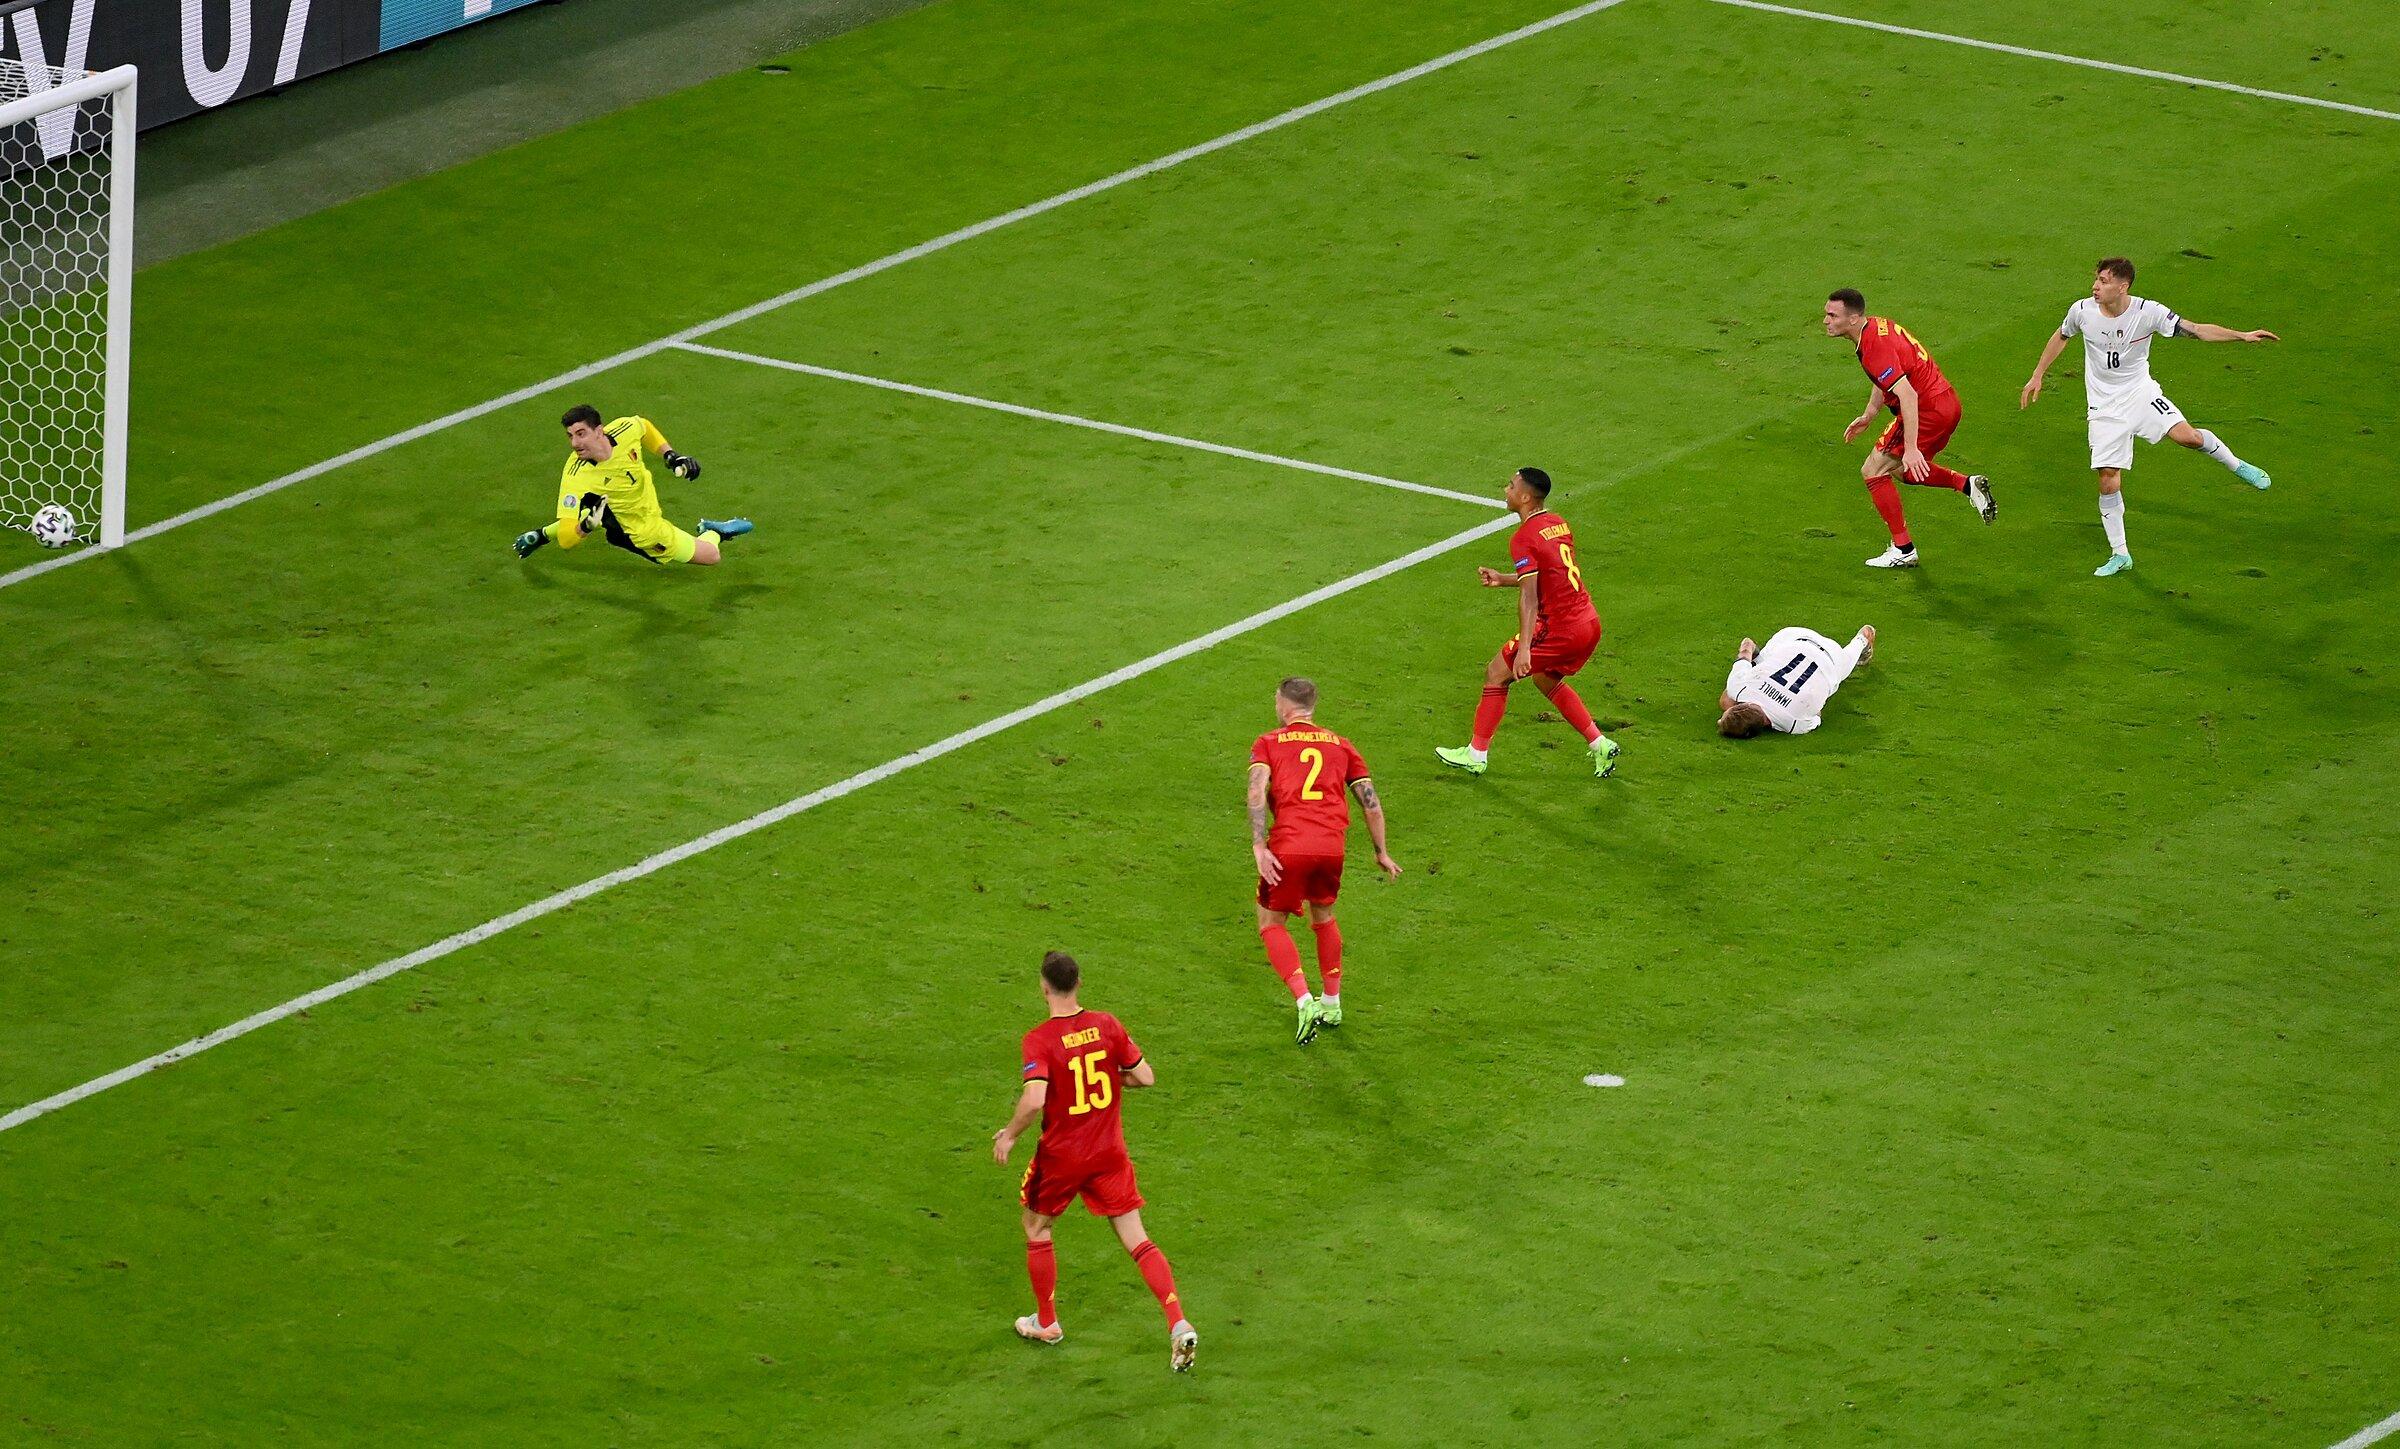 Gol pembuka Nicolo Barella untuk Italia.  Foto: FIGC